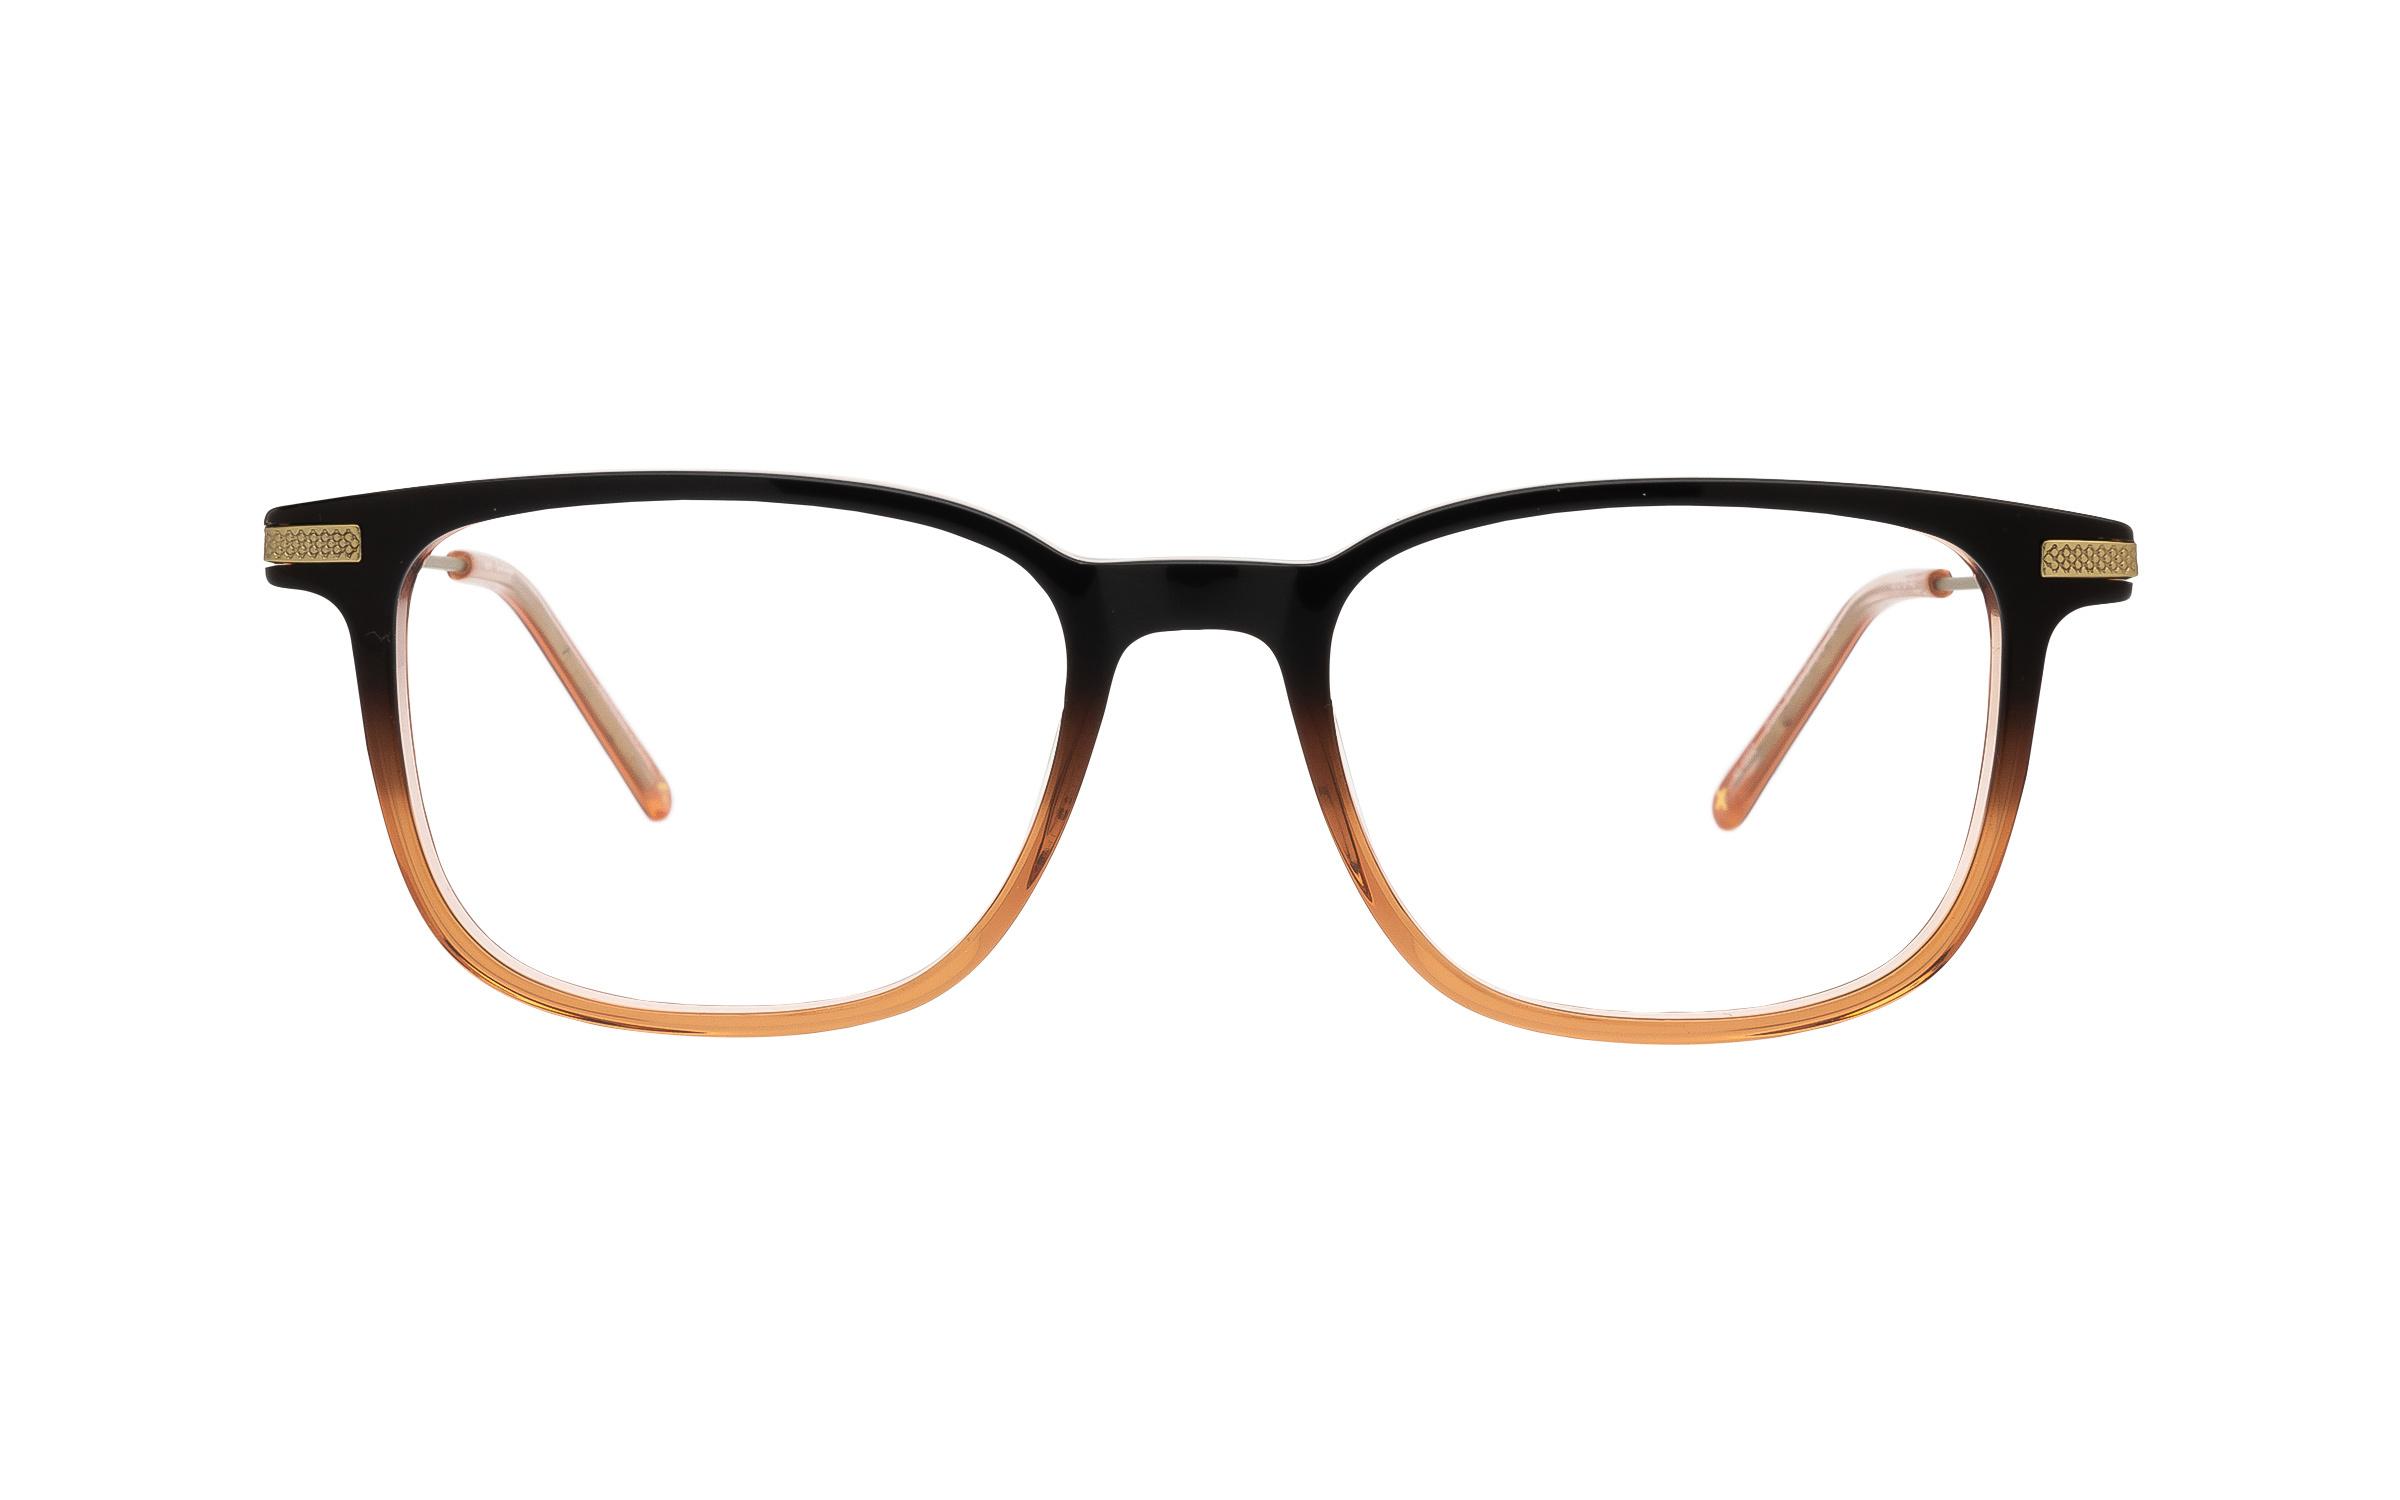 coastal.com - Derek Cardigan Dione (52) Eyeglasses and Frame in Ombre Brown | Acetate/Metal – Online Coastal 55.00 USD